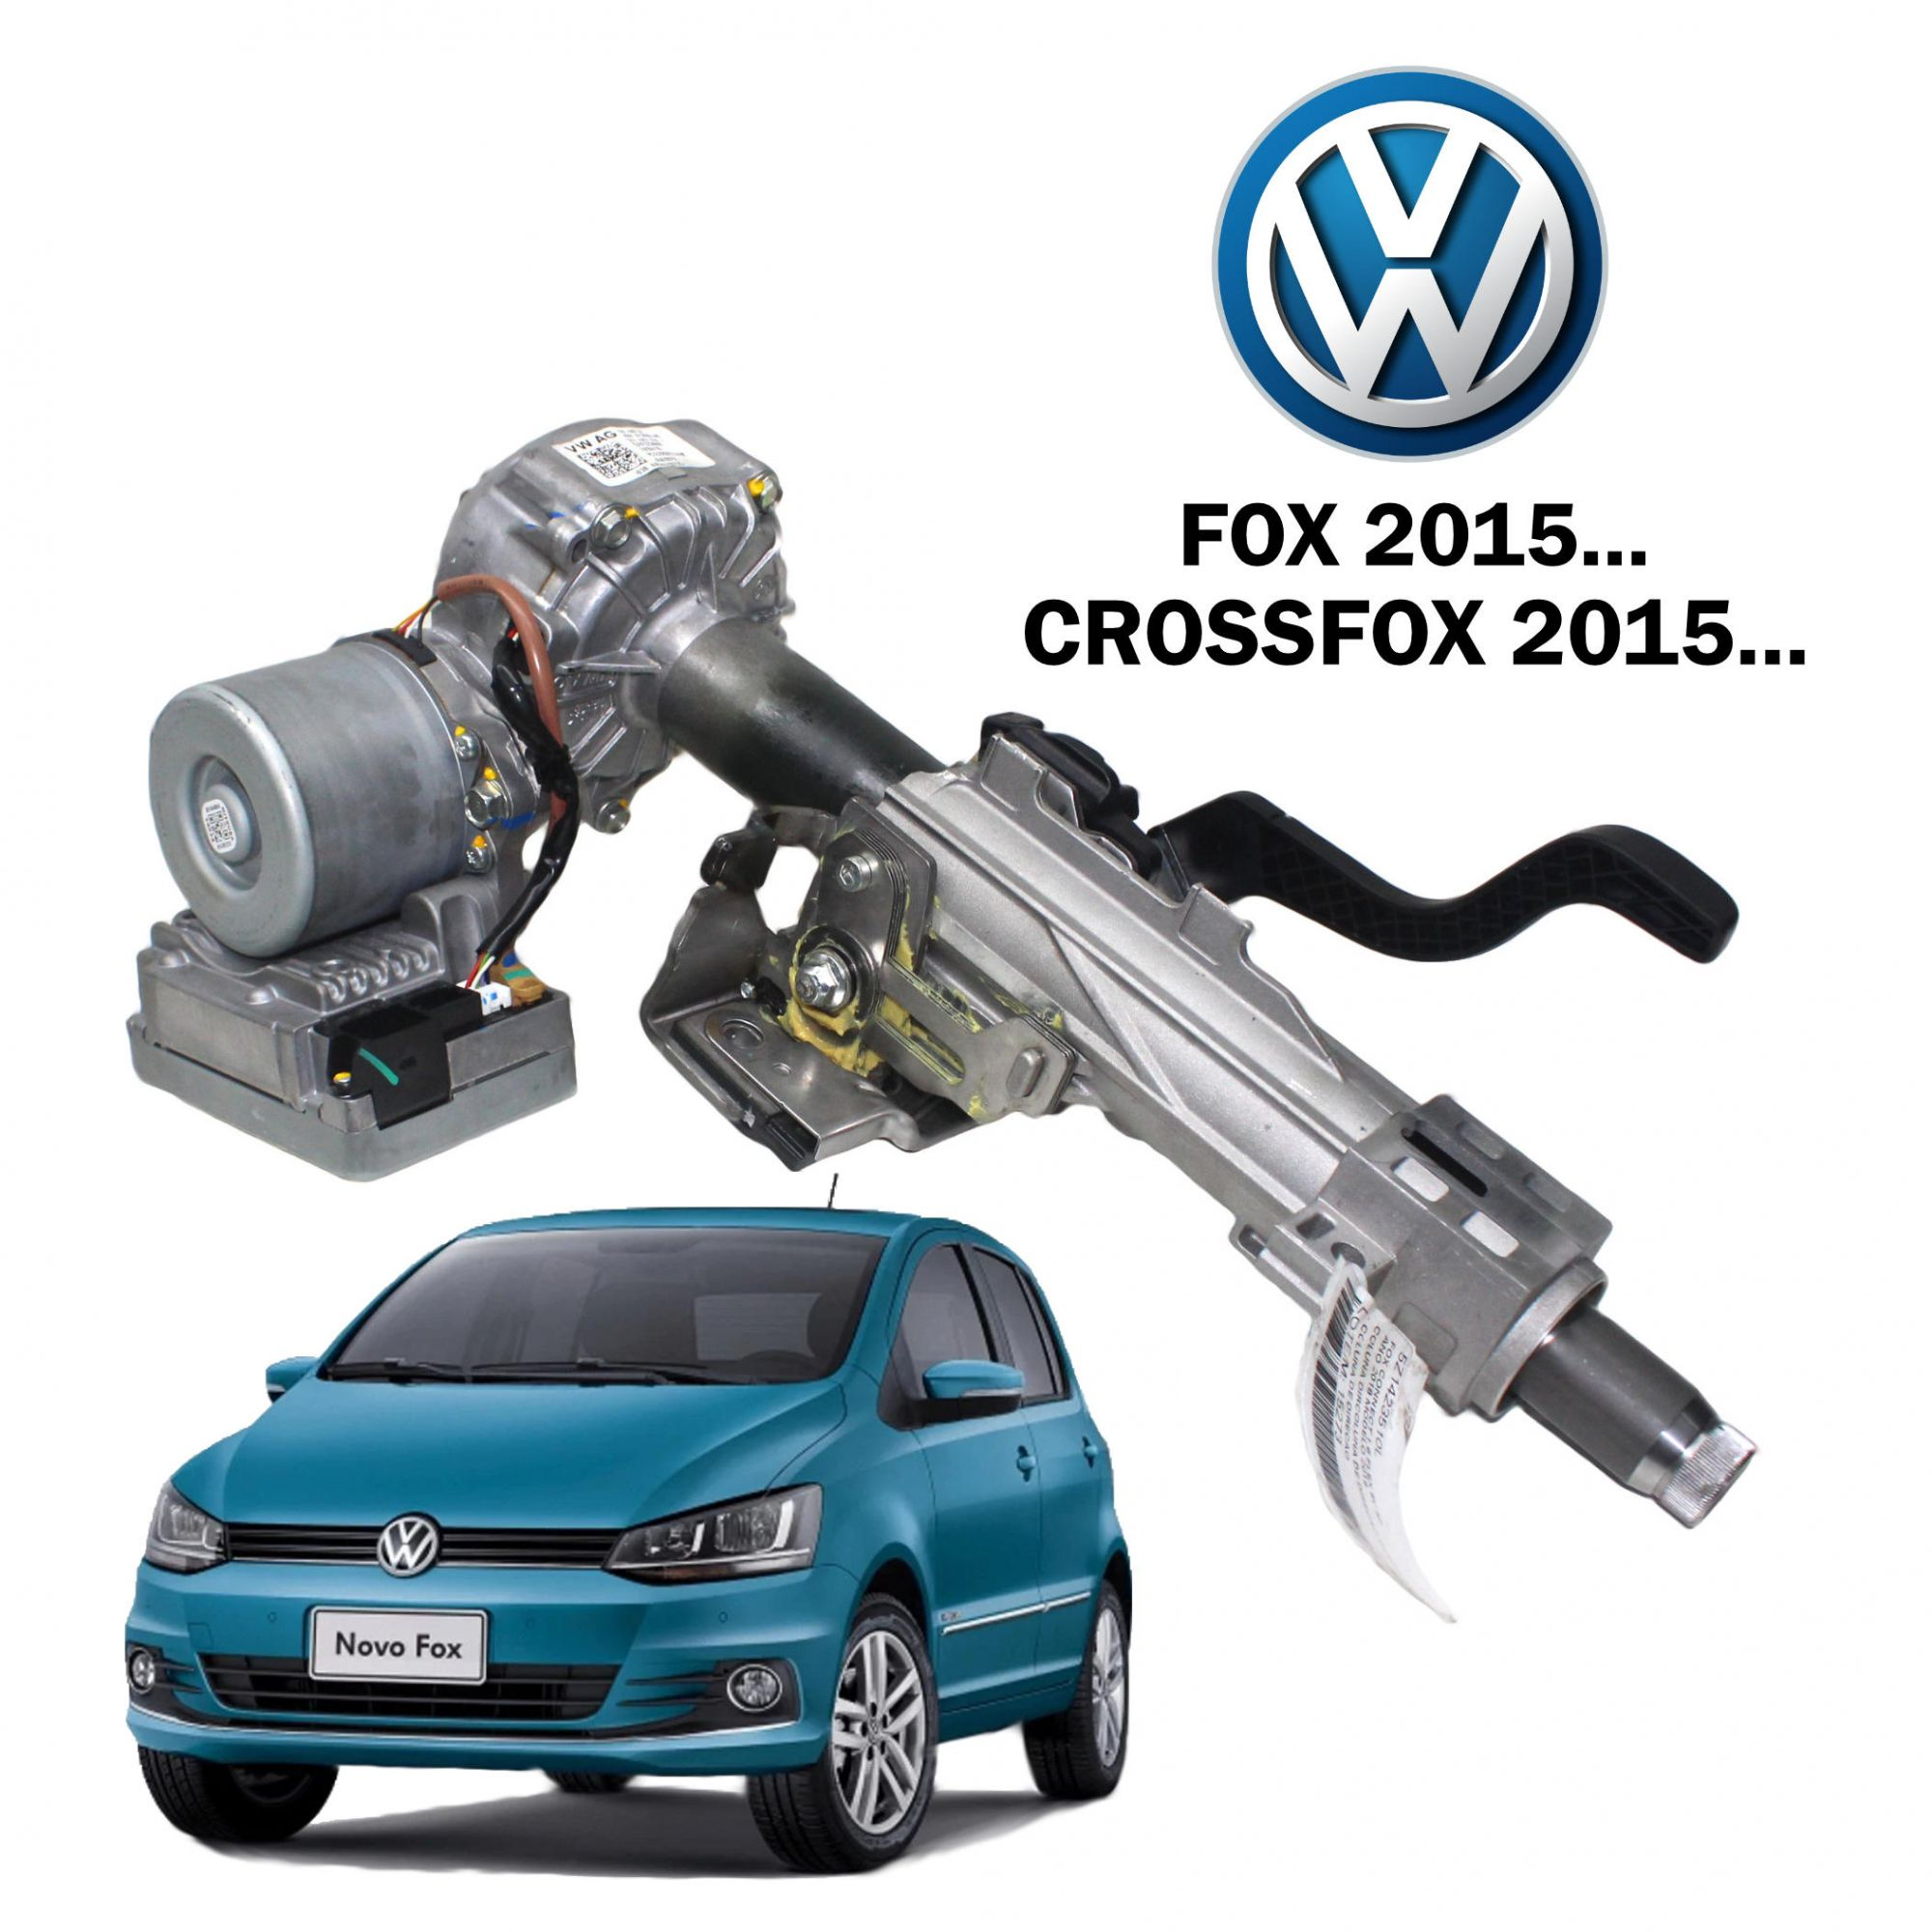 Motor Coluna Direção Elétrica Fox 2015... 5Z1423510L